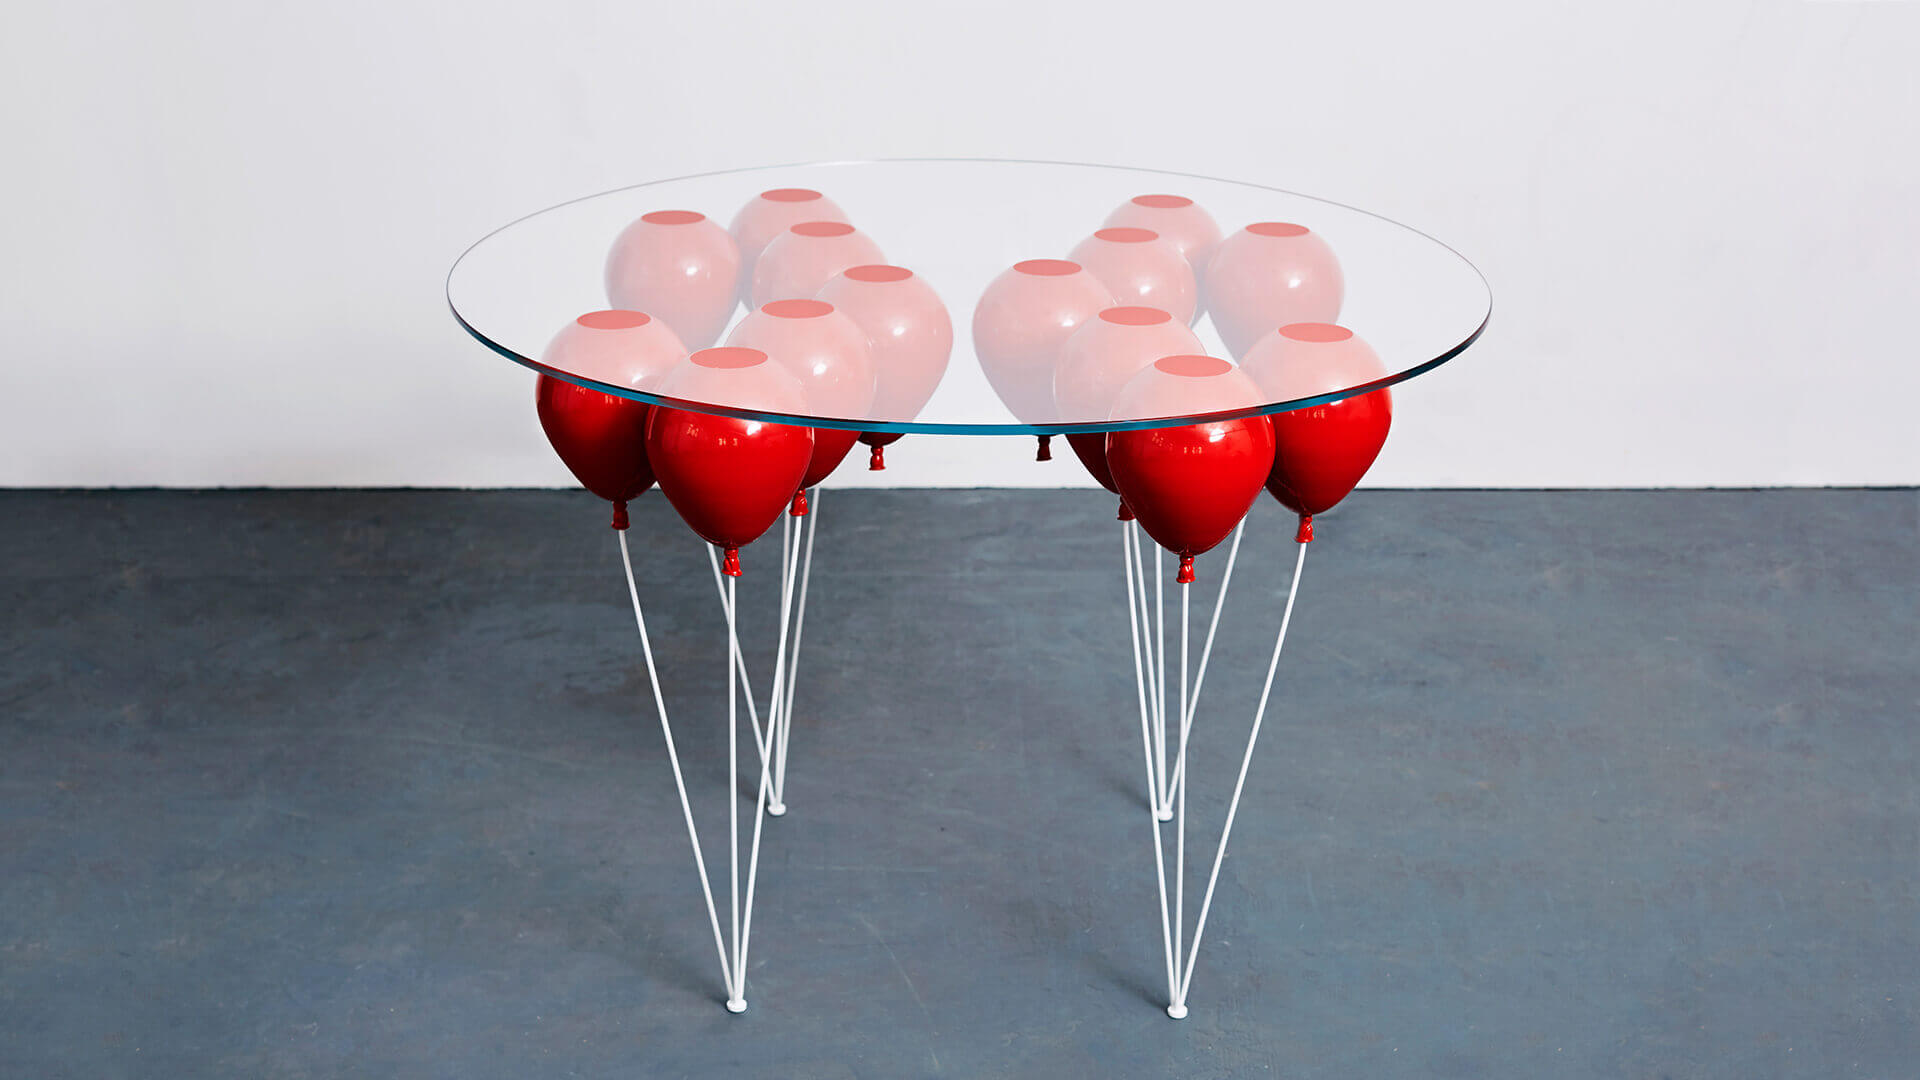 Balloon Dining Round_Carousel_07